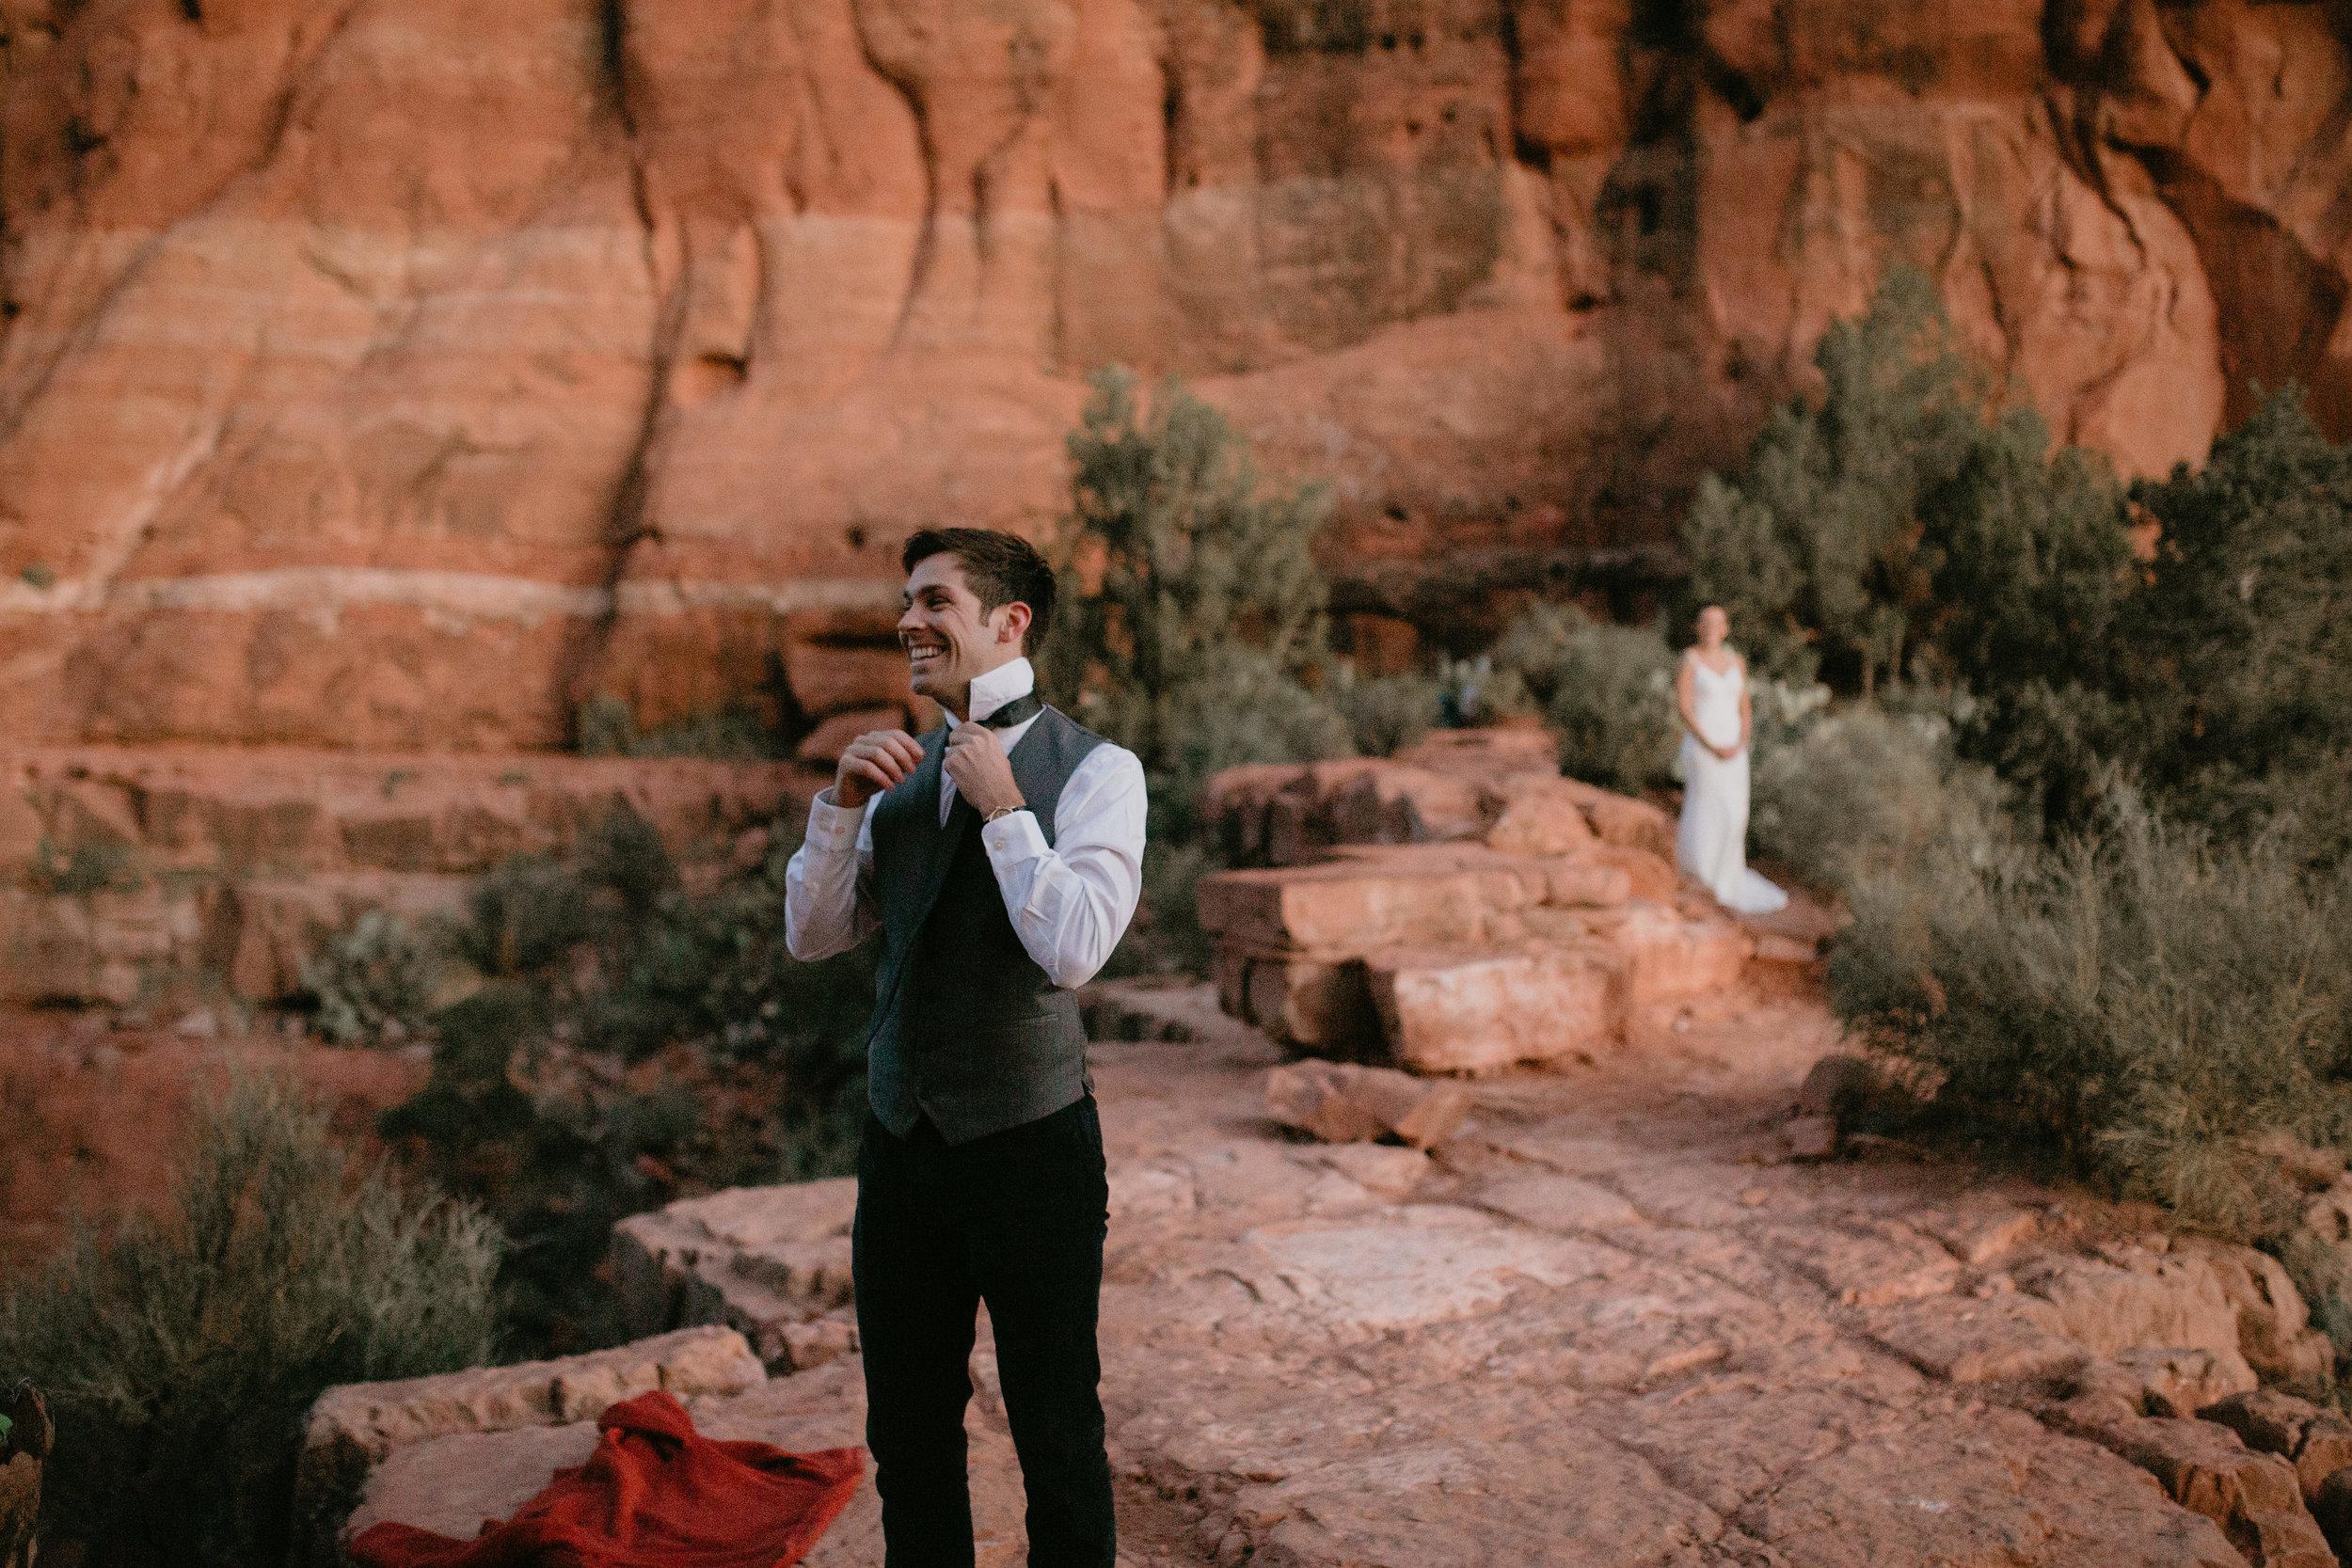 nicole-daacke-photography-sedona-arizona-destination-elopement-wedding-photographer-catherdral-rock-hiking-elopement-sedona-river-elopement-photos-desert-rock-wedding-photographer-laid-back-spontaneous-elopement-2.jpg